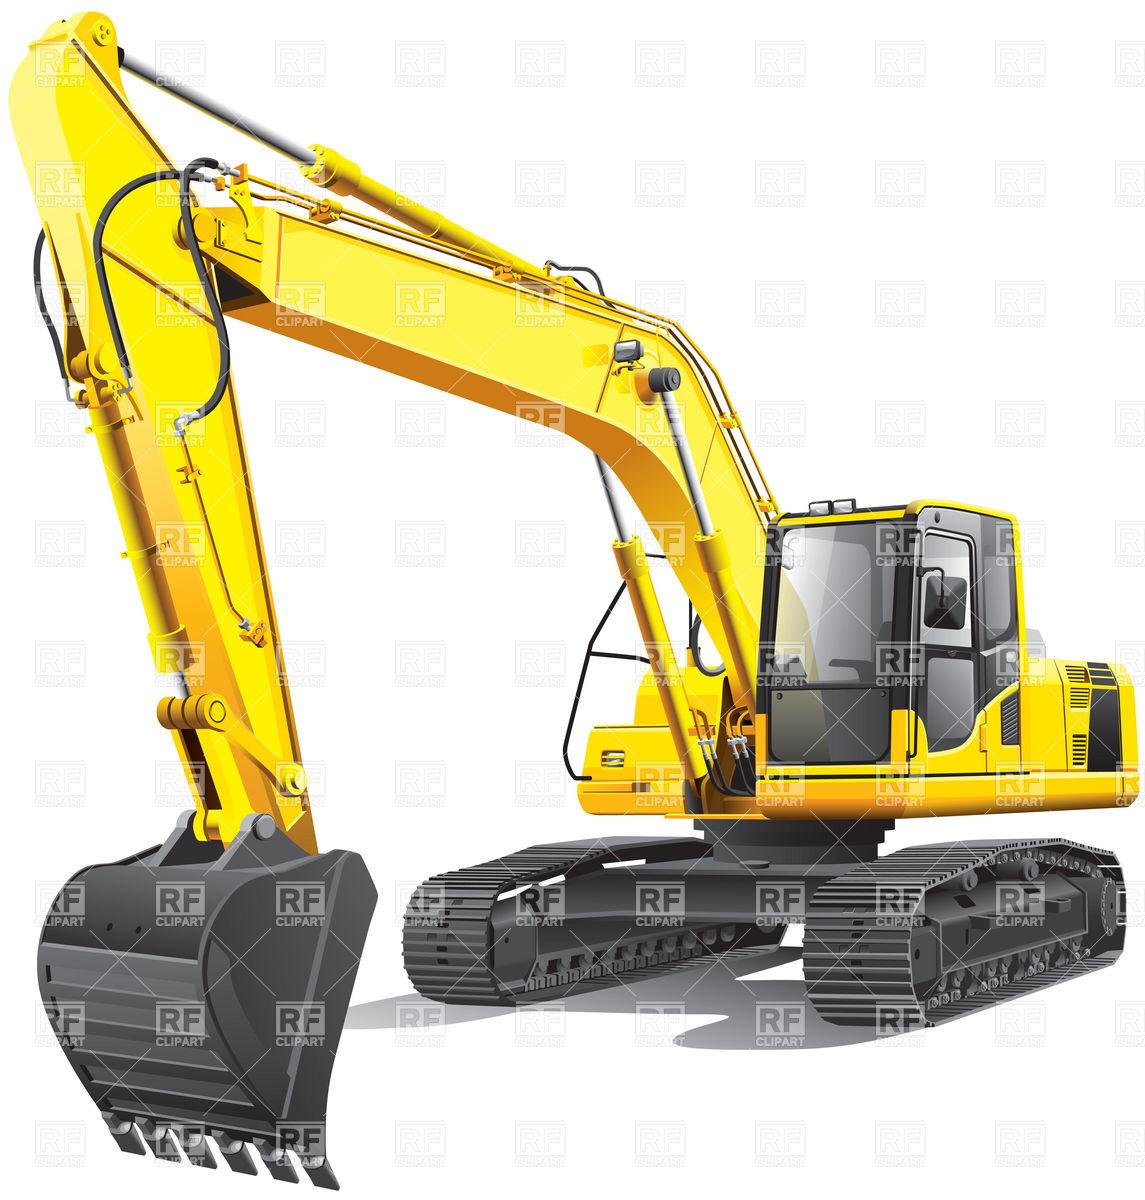 Large yellow crawler excavator Vector Image #6197.